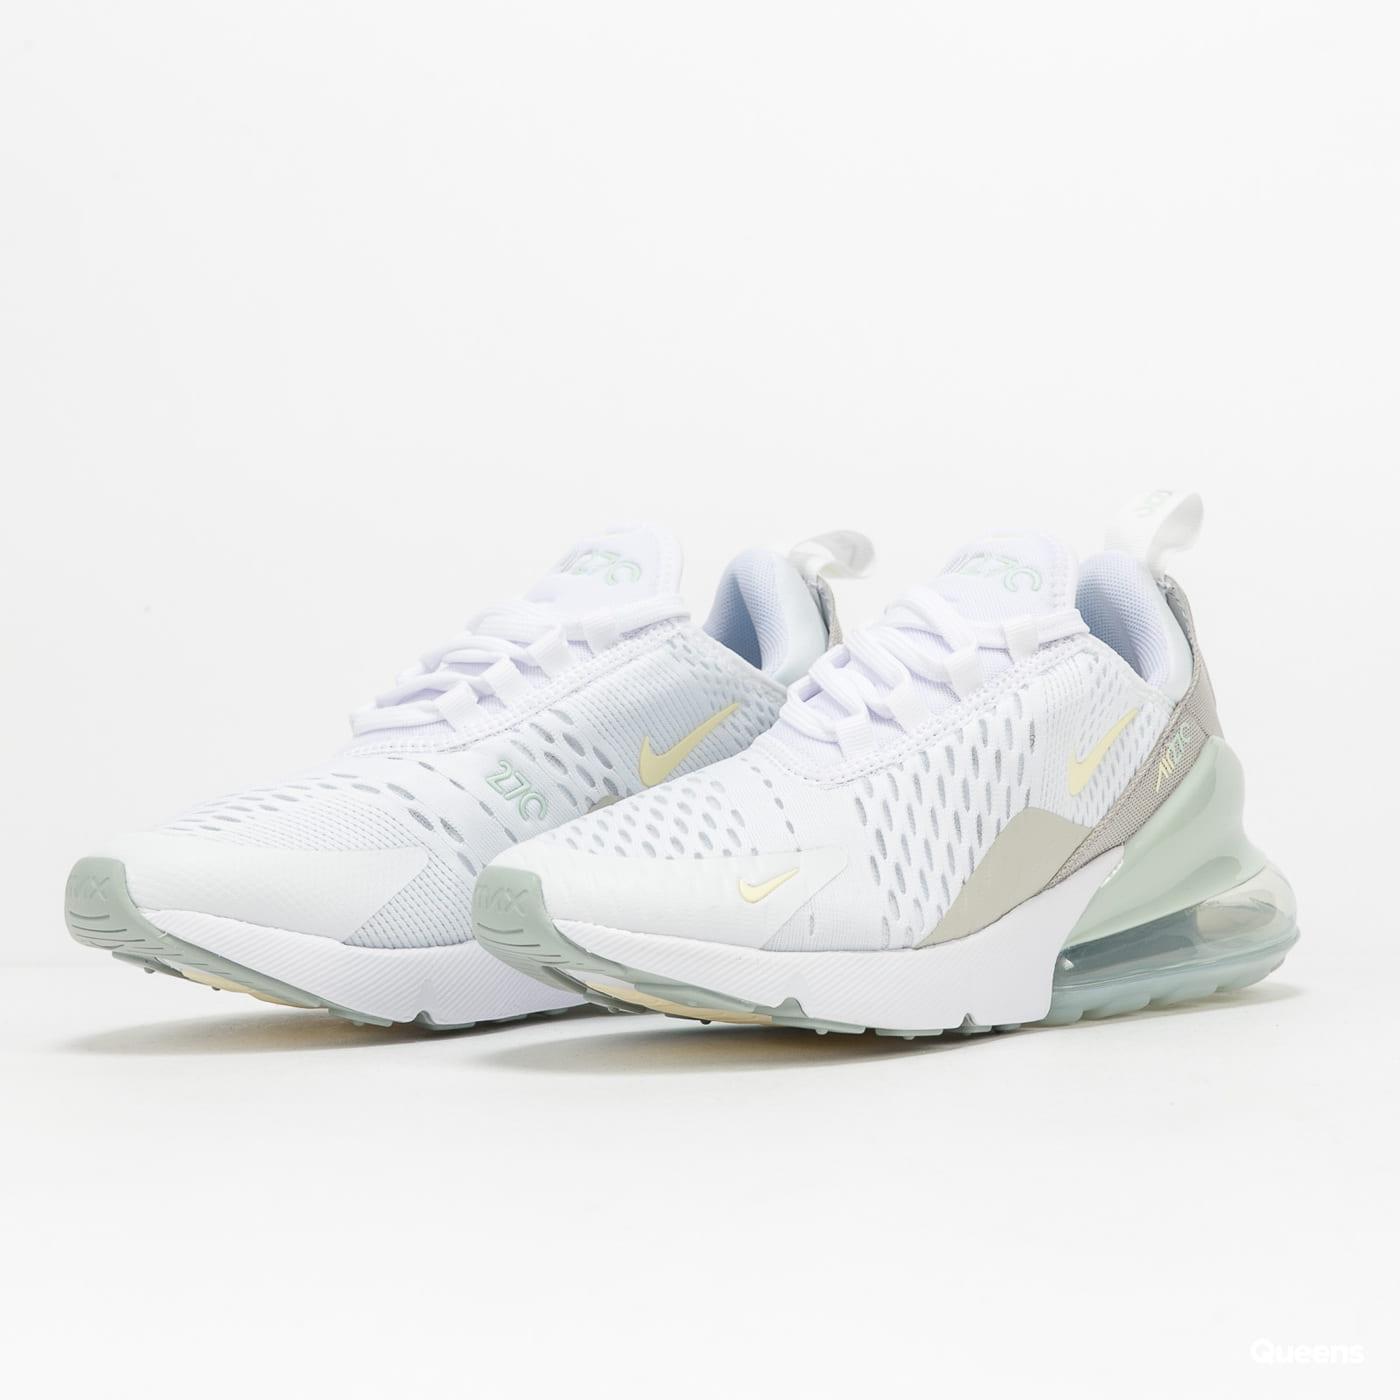 Nike WMNS Air Max 270 Ess white / cashmere - grey haze